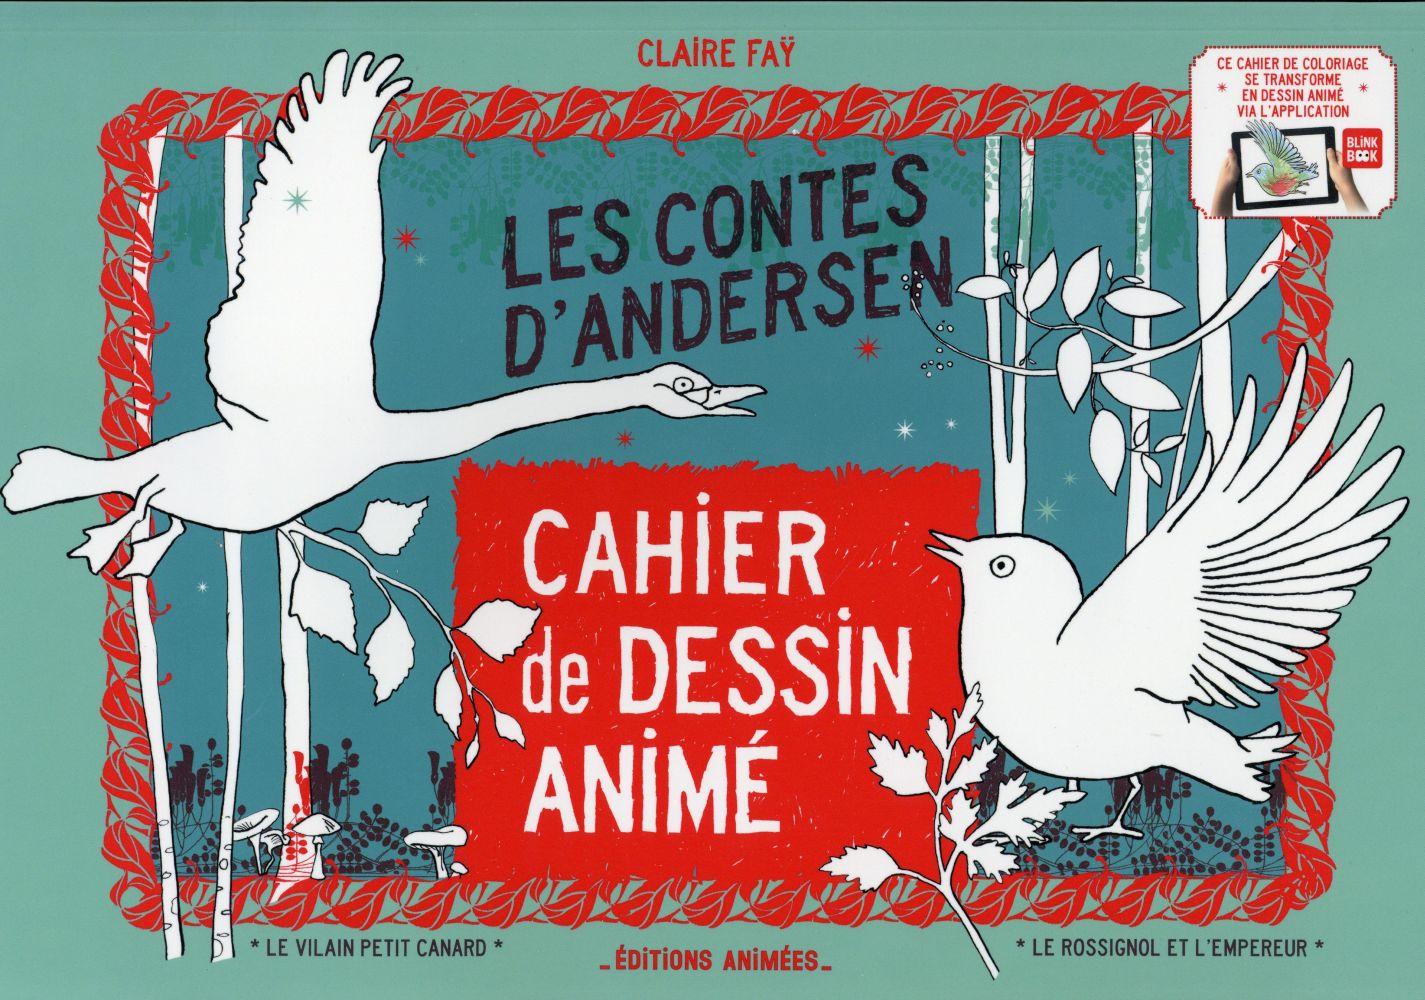 CAHIER DE DESSIN ANIME LES CONTES D'ANDERSEN